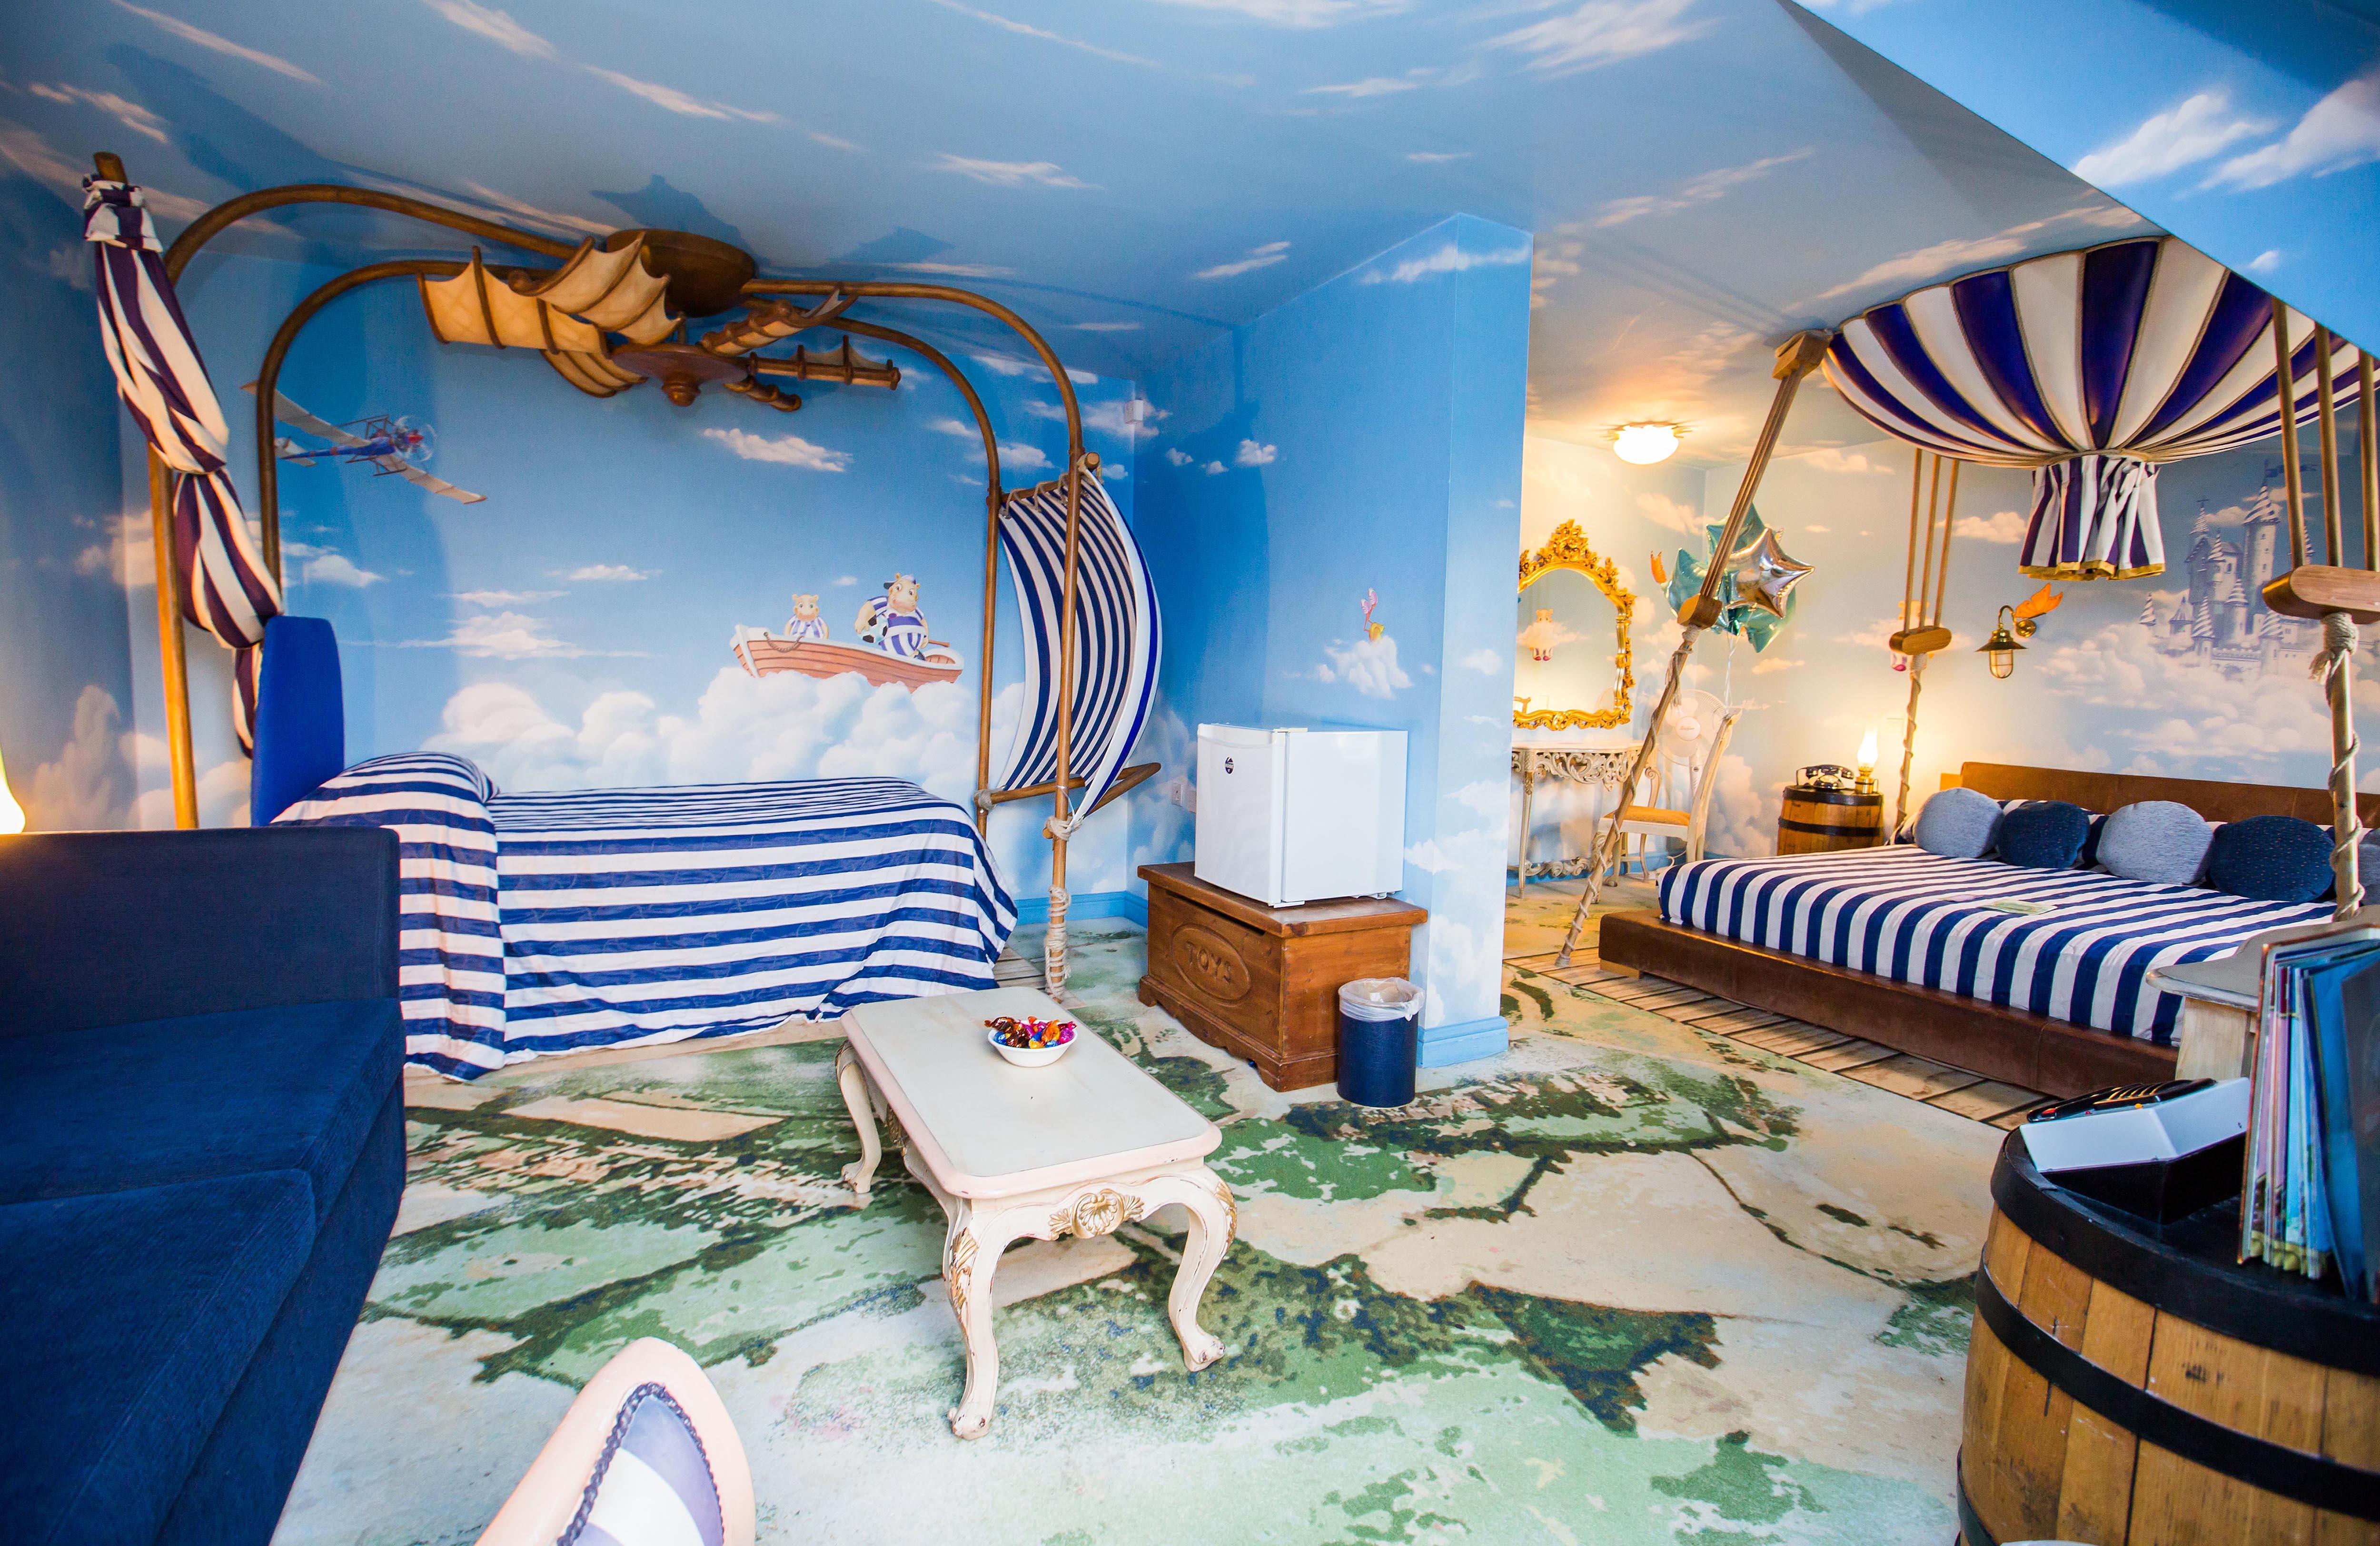 Big Pyjama Room TowersTimes : BigPyjamaRoom from www.towerstimes.co.uk size 5000 x 3248 jpeg 1932kB